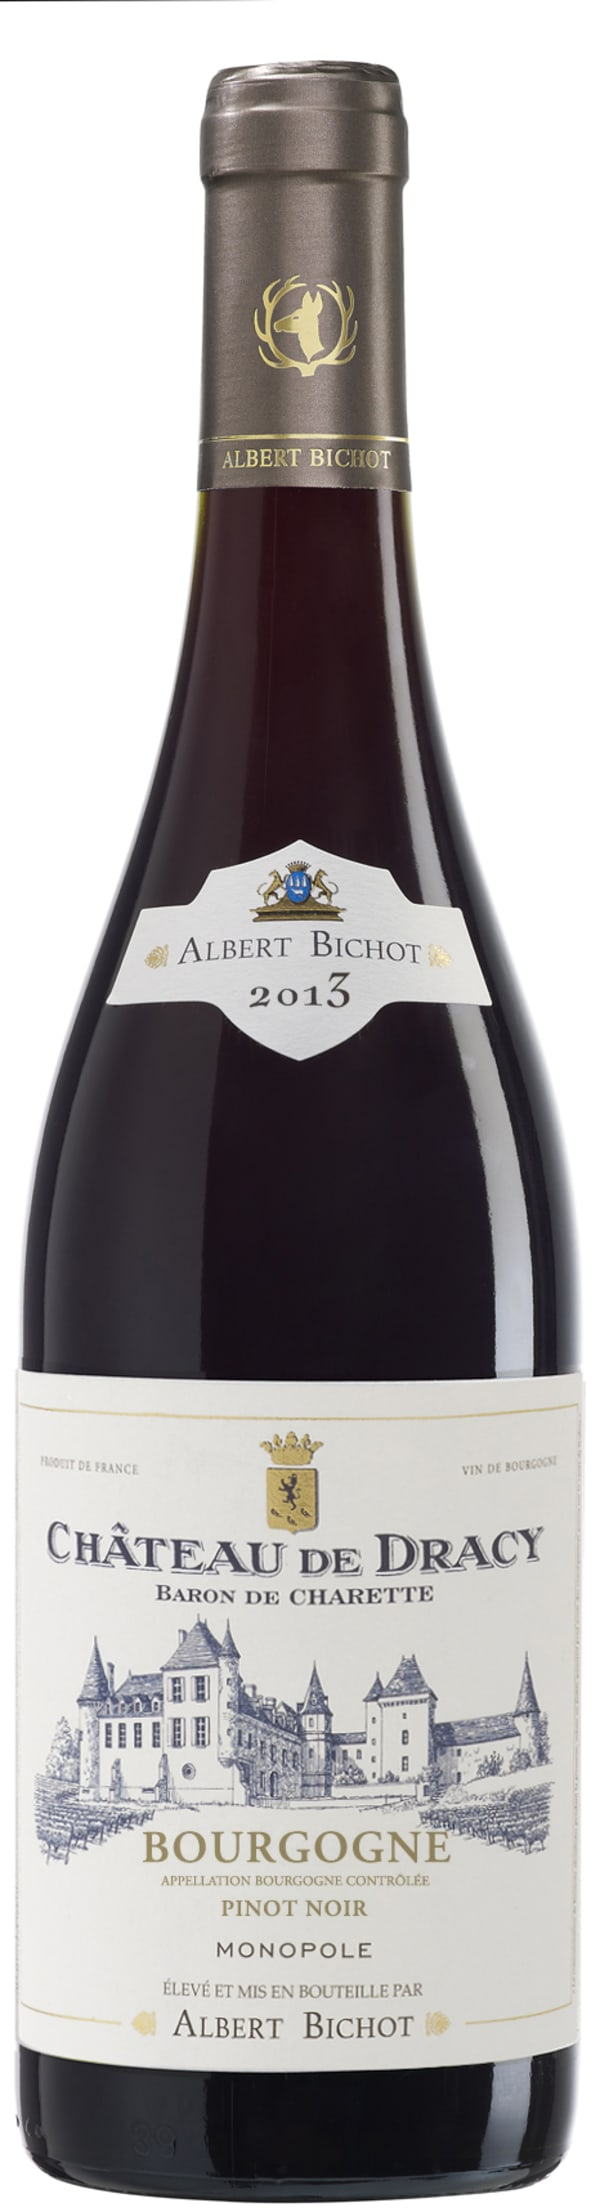 Château de Dracy Pinot Noir 2016